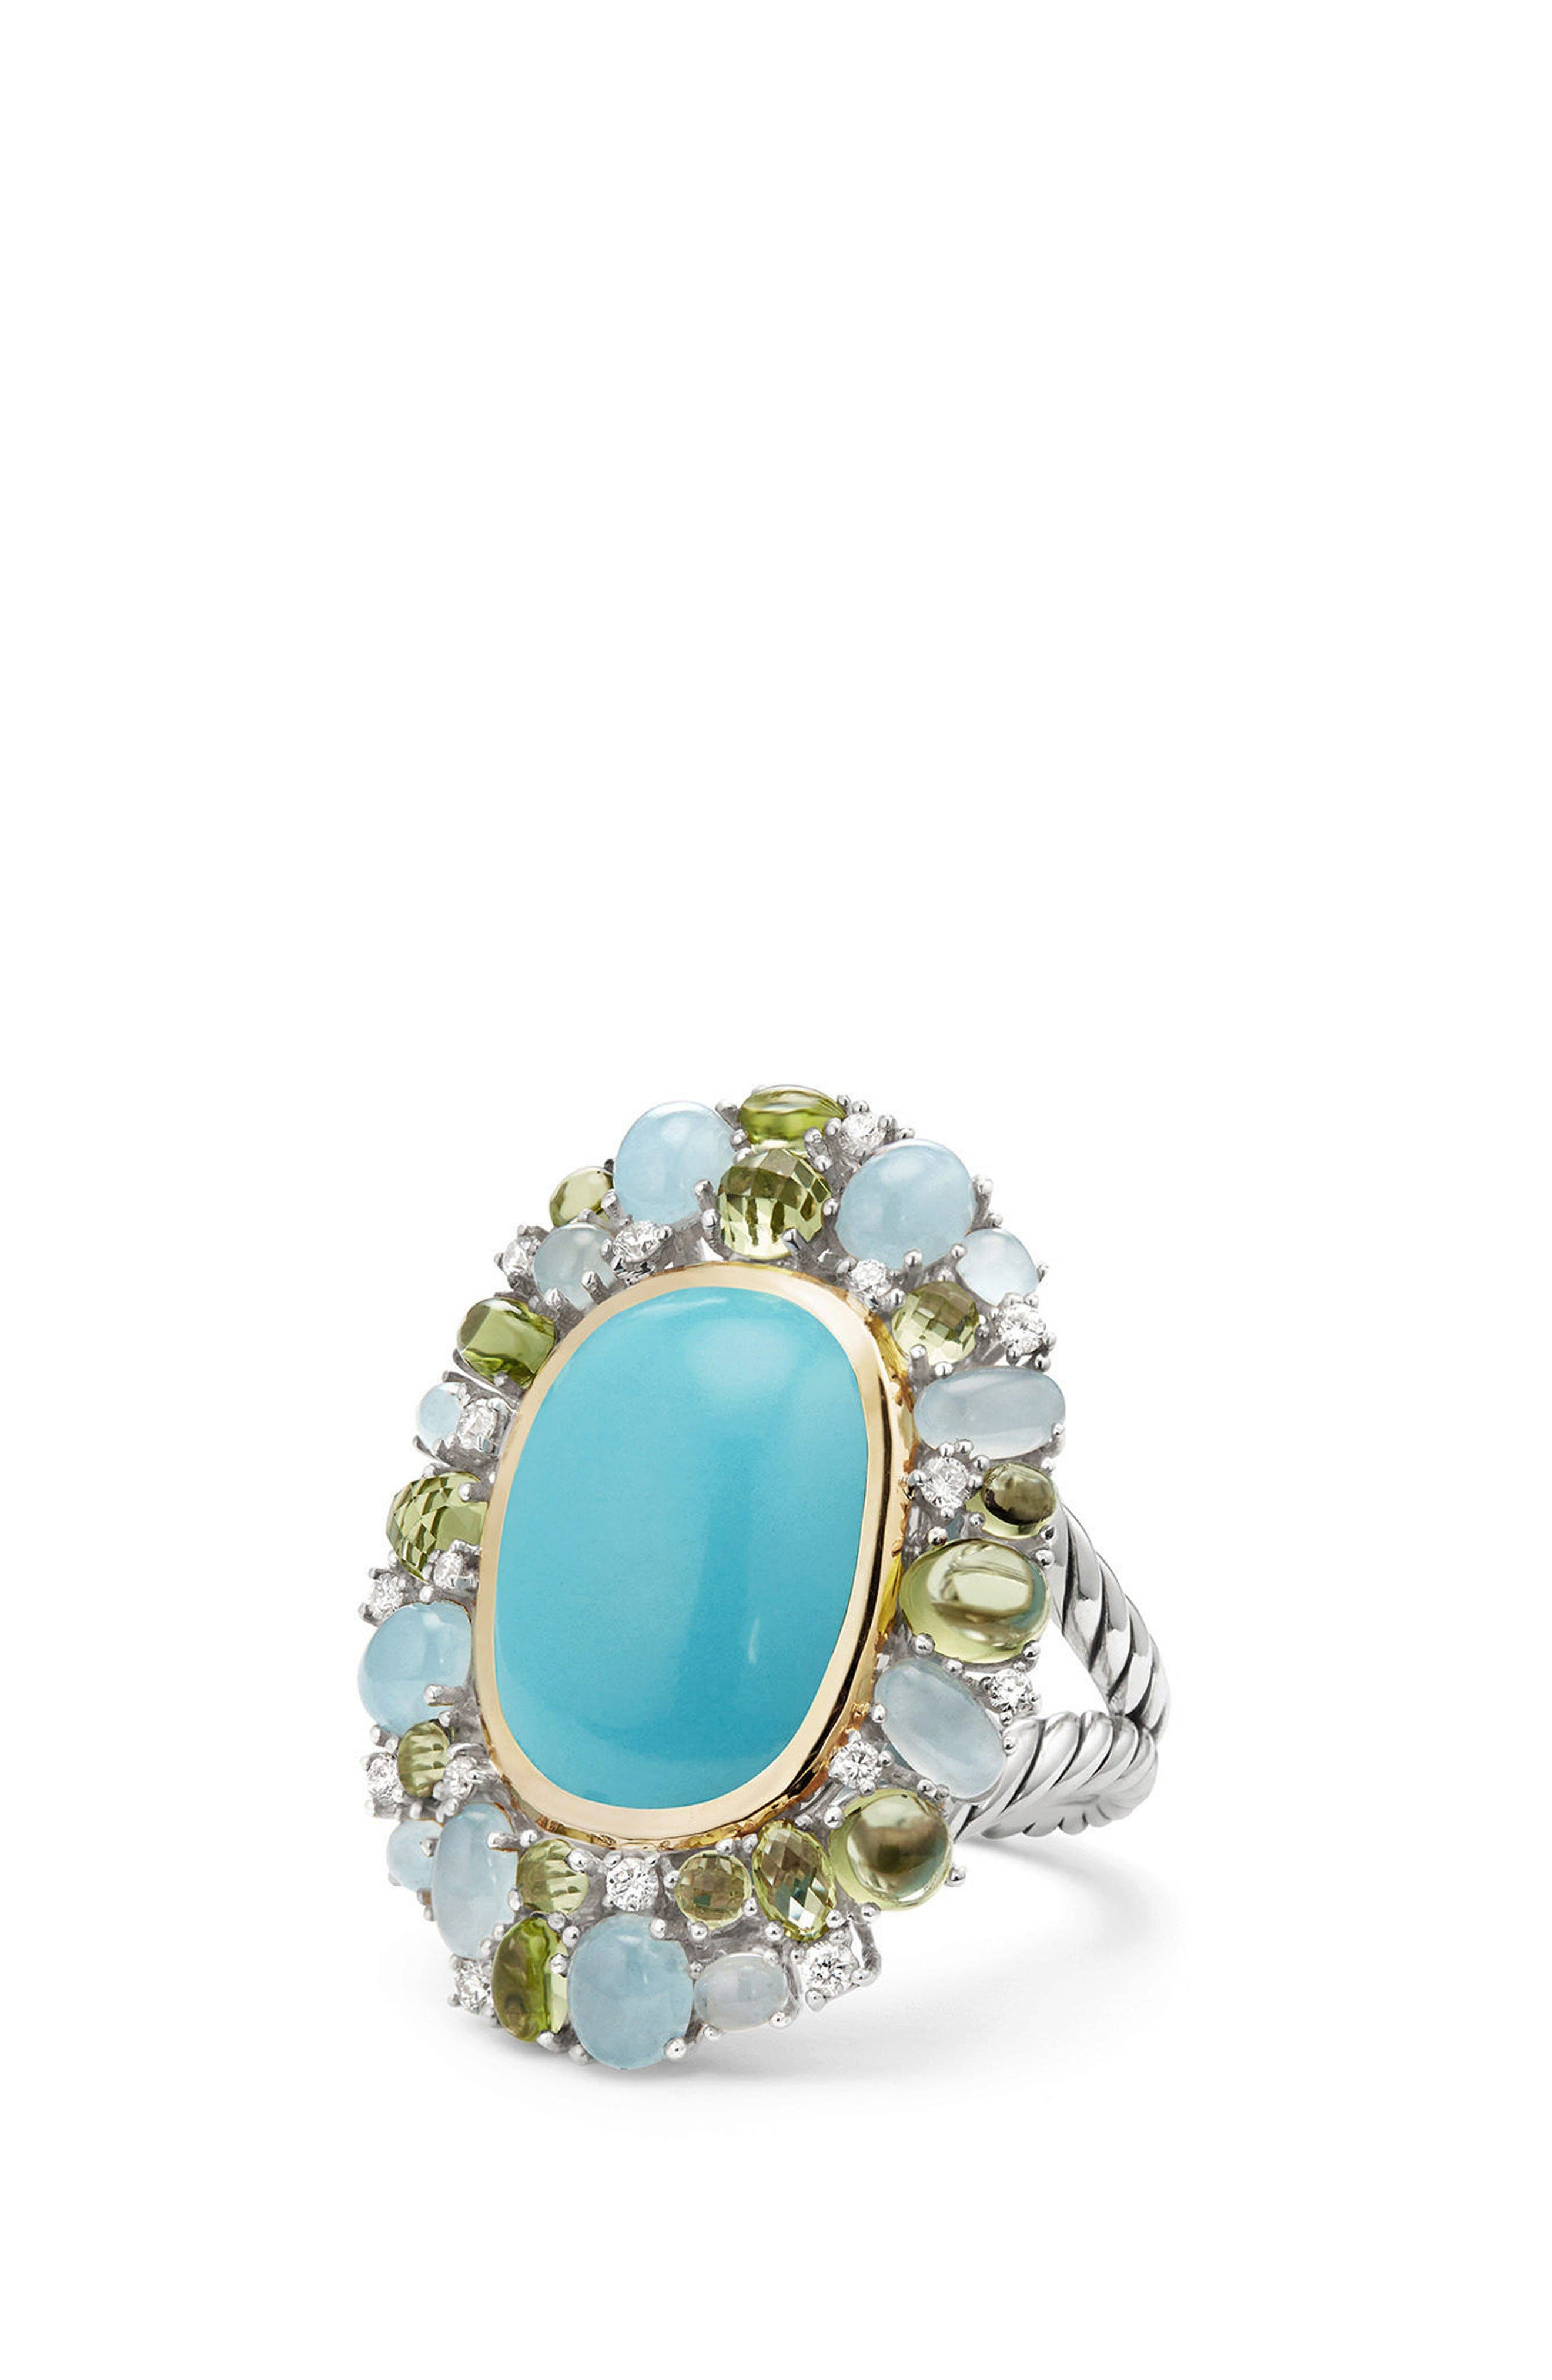 Alternate Image 1 Selected - David Yurman Mustique Statement Ring with Diamonds